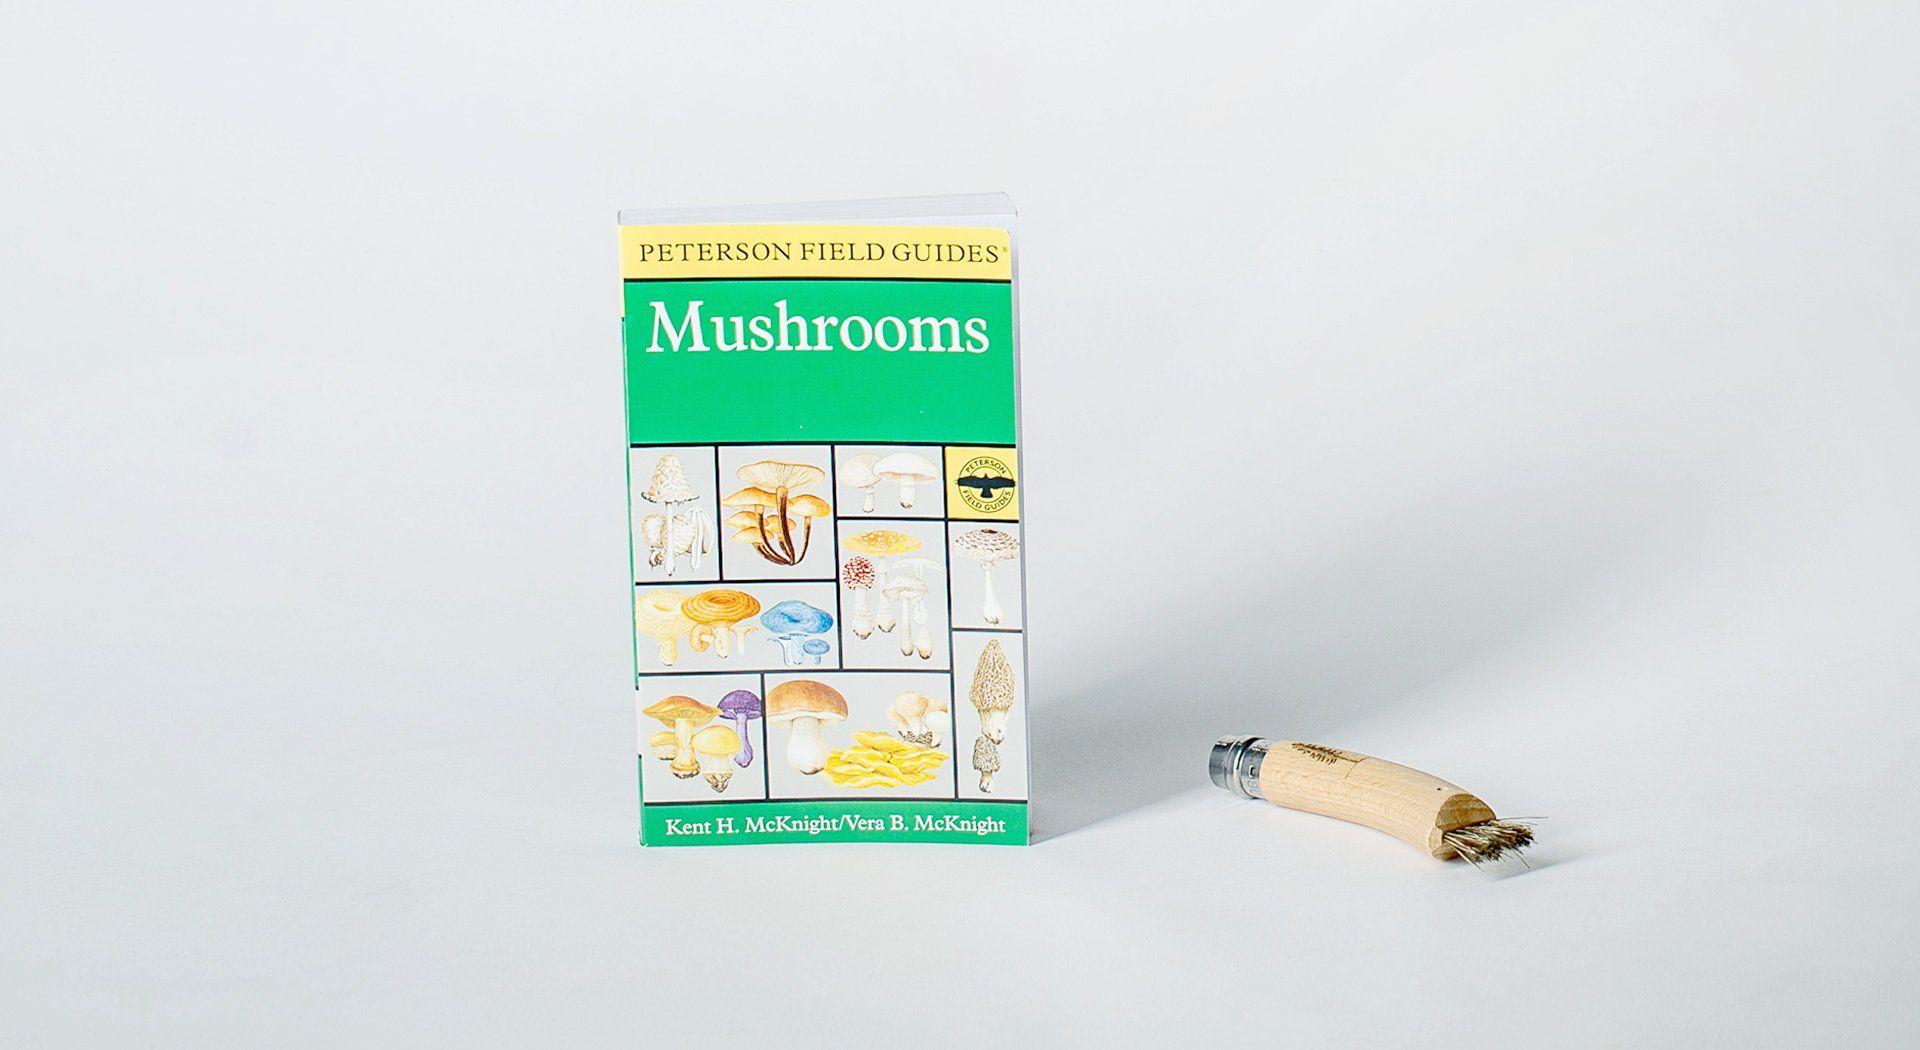 A Peterson Field Guide to Mushrooms: North America Authors Kent H. McKnight  Vera B